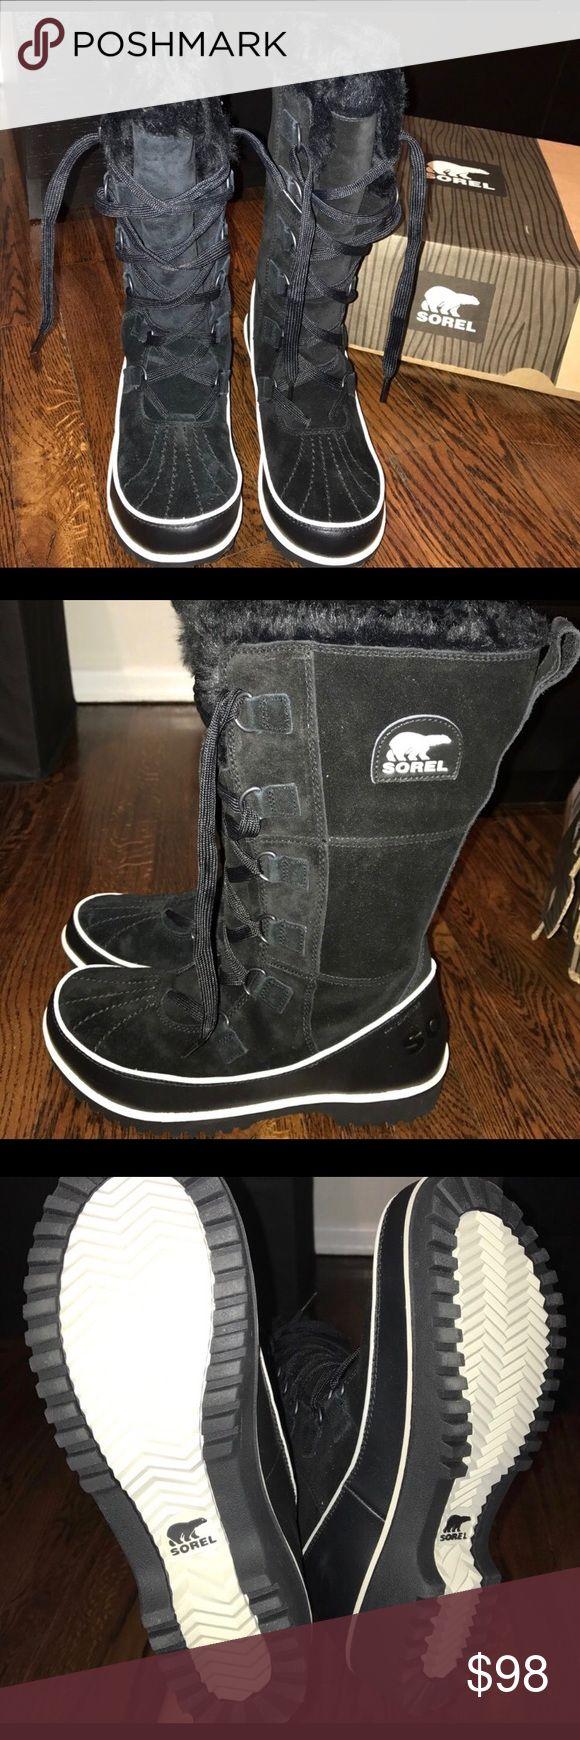 Brand new sorel snow boots size 9 Sorel snow boots size 9 never worn Sorel Shoes Winter & Rain Boots